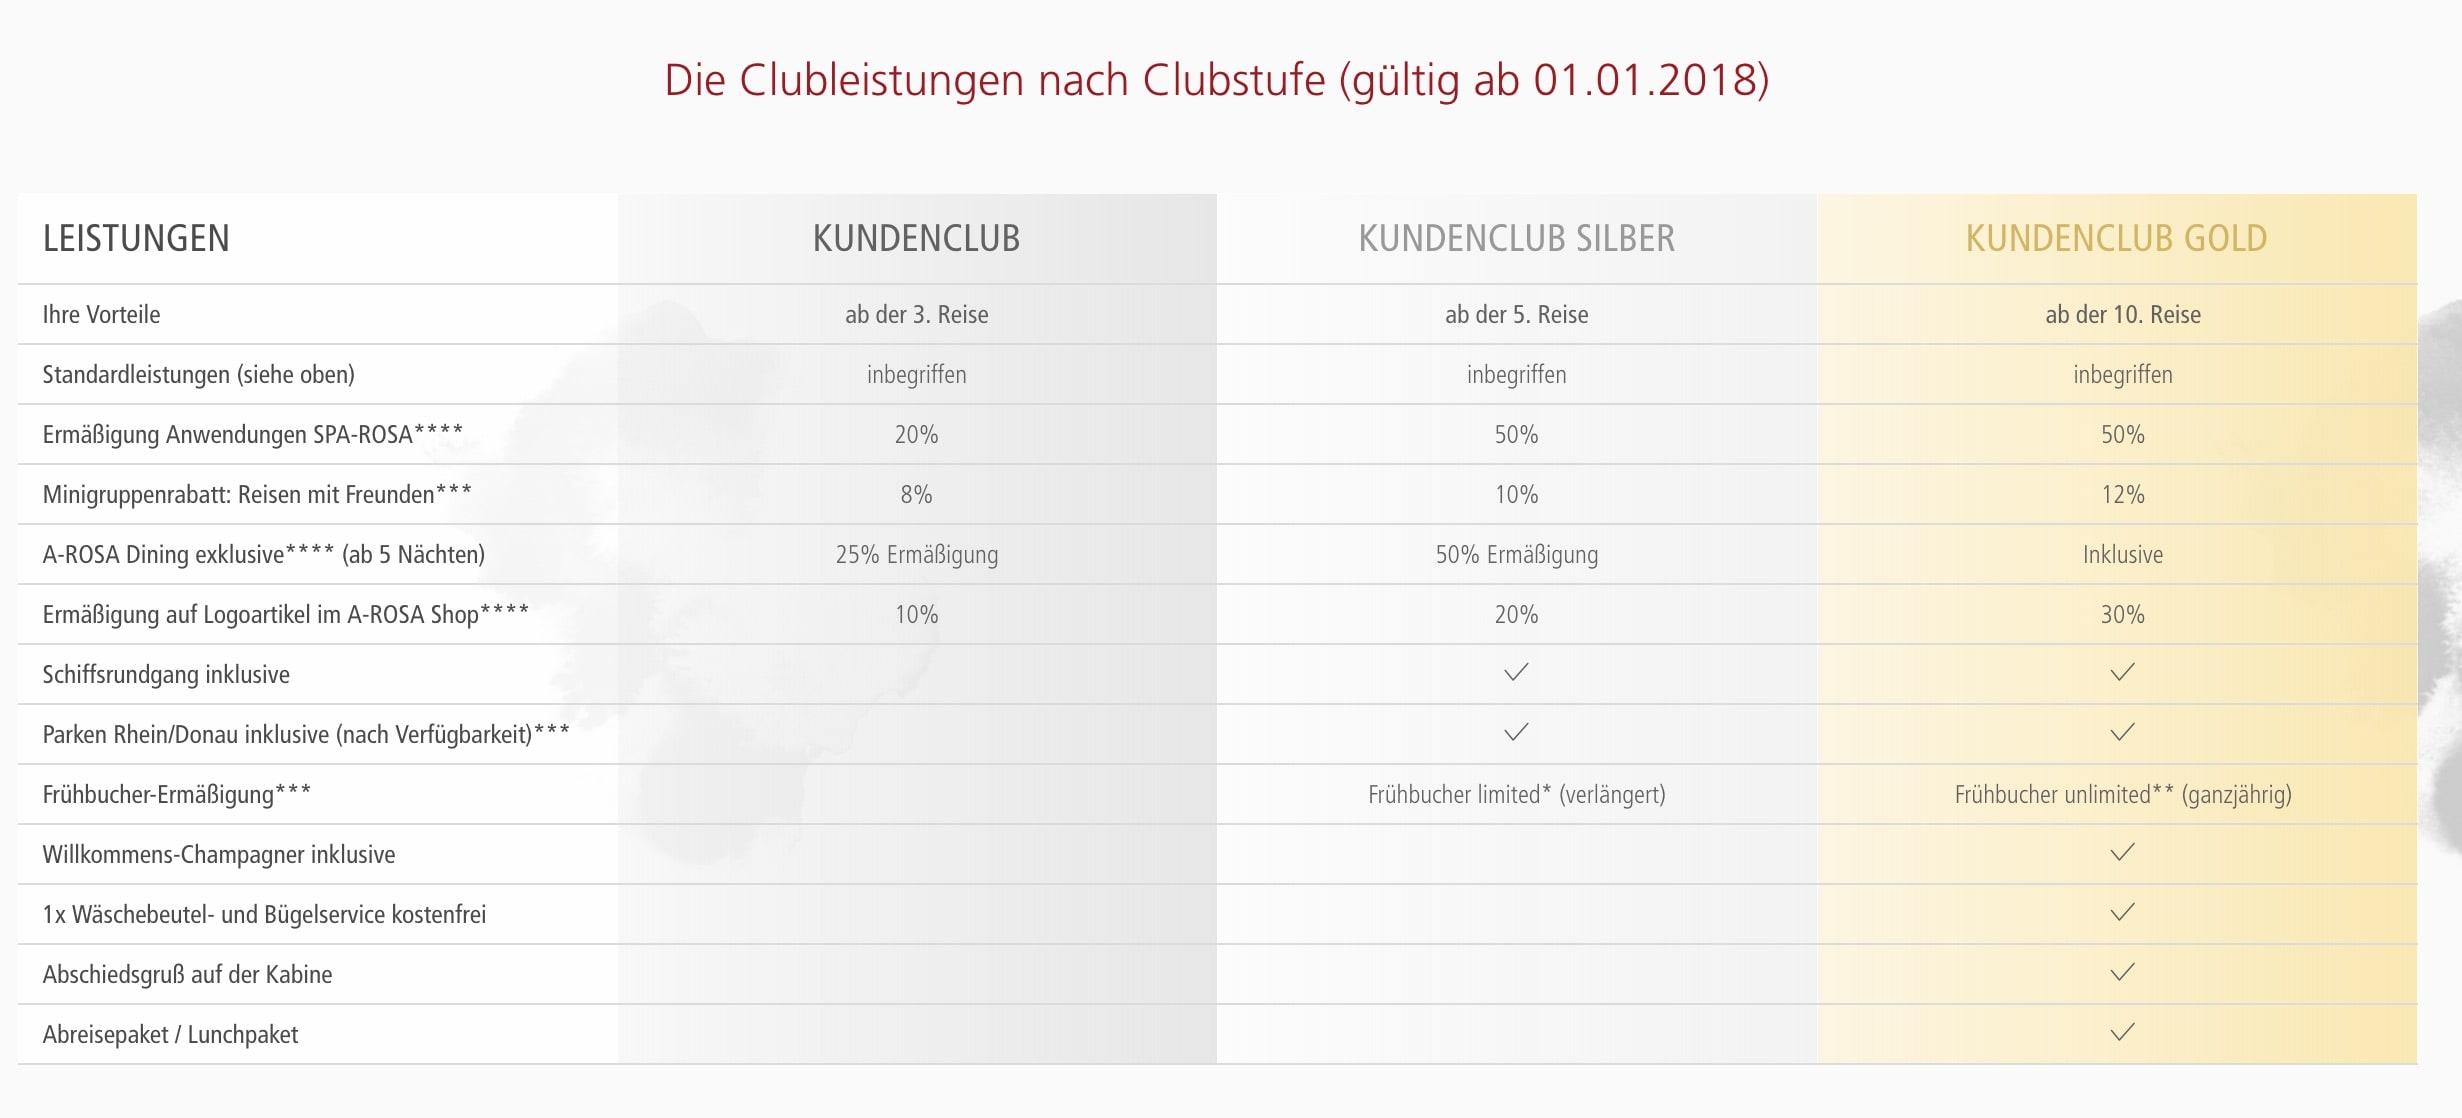 A-Rosa Club: Die Leistungen nach Clubstufe